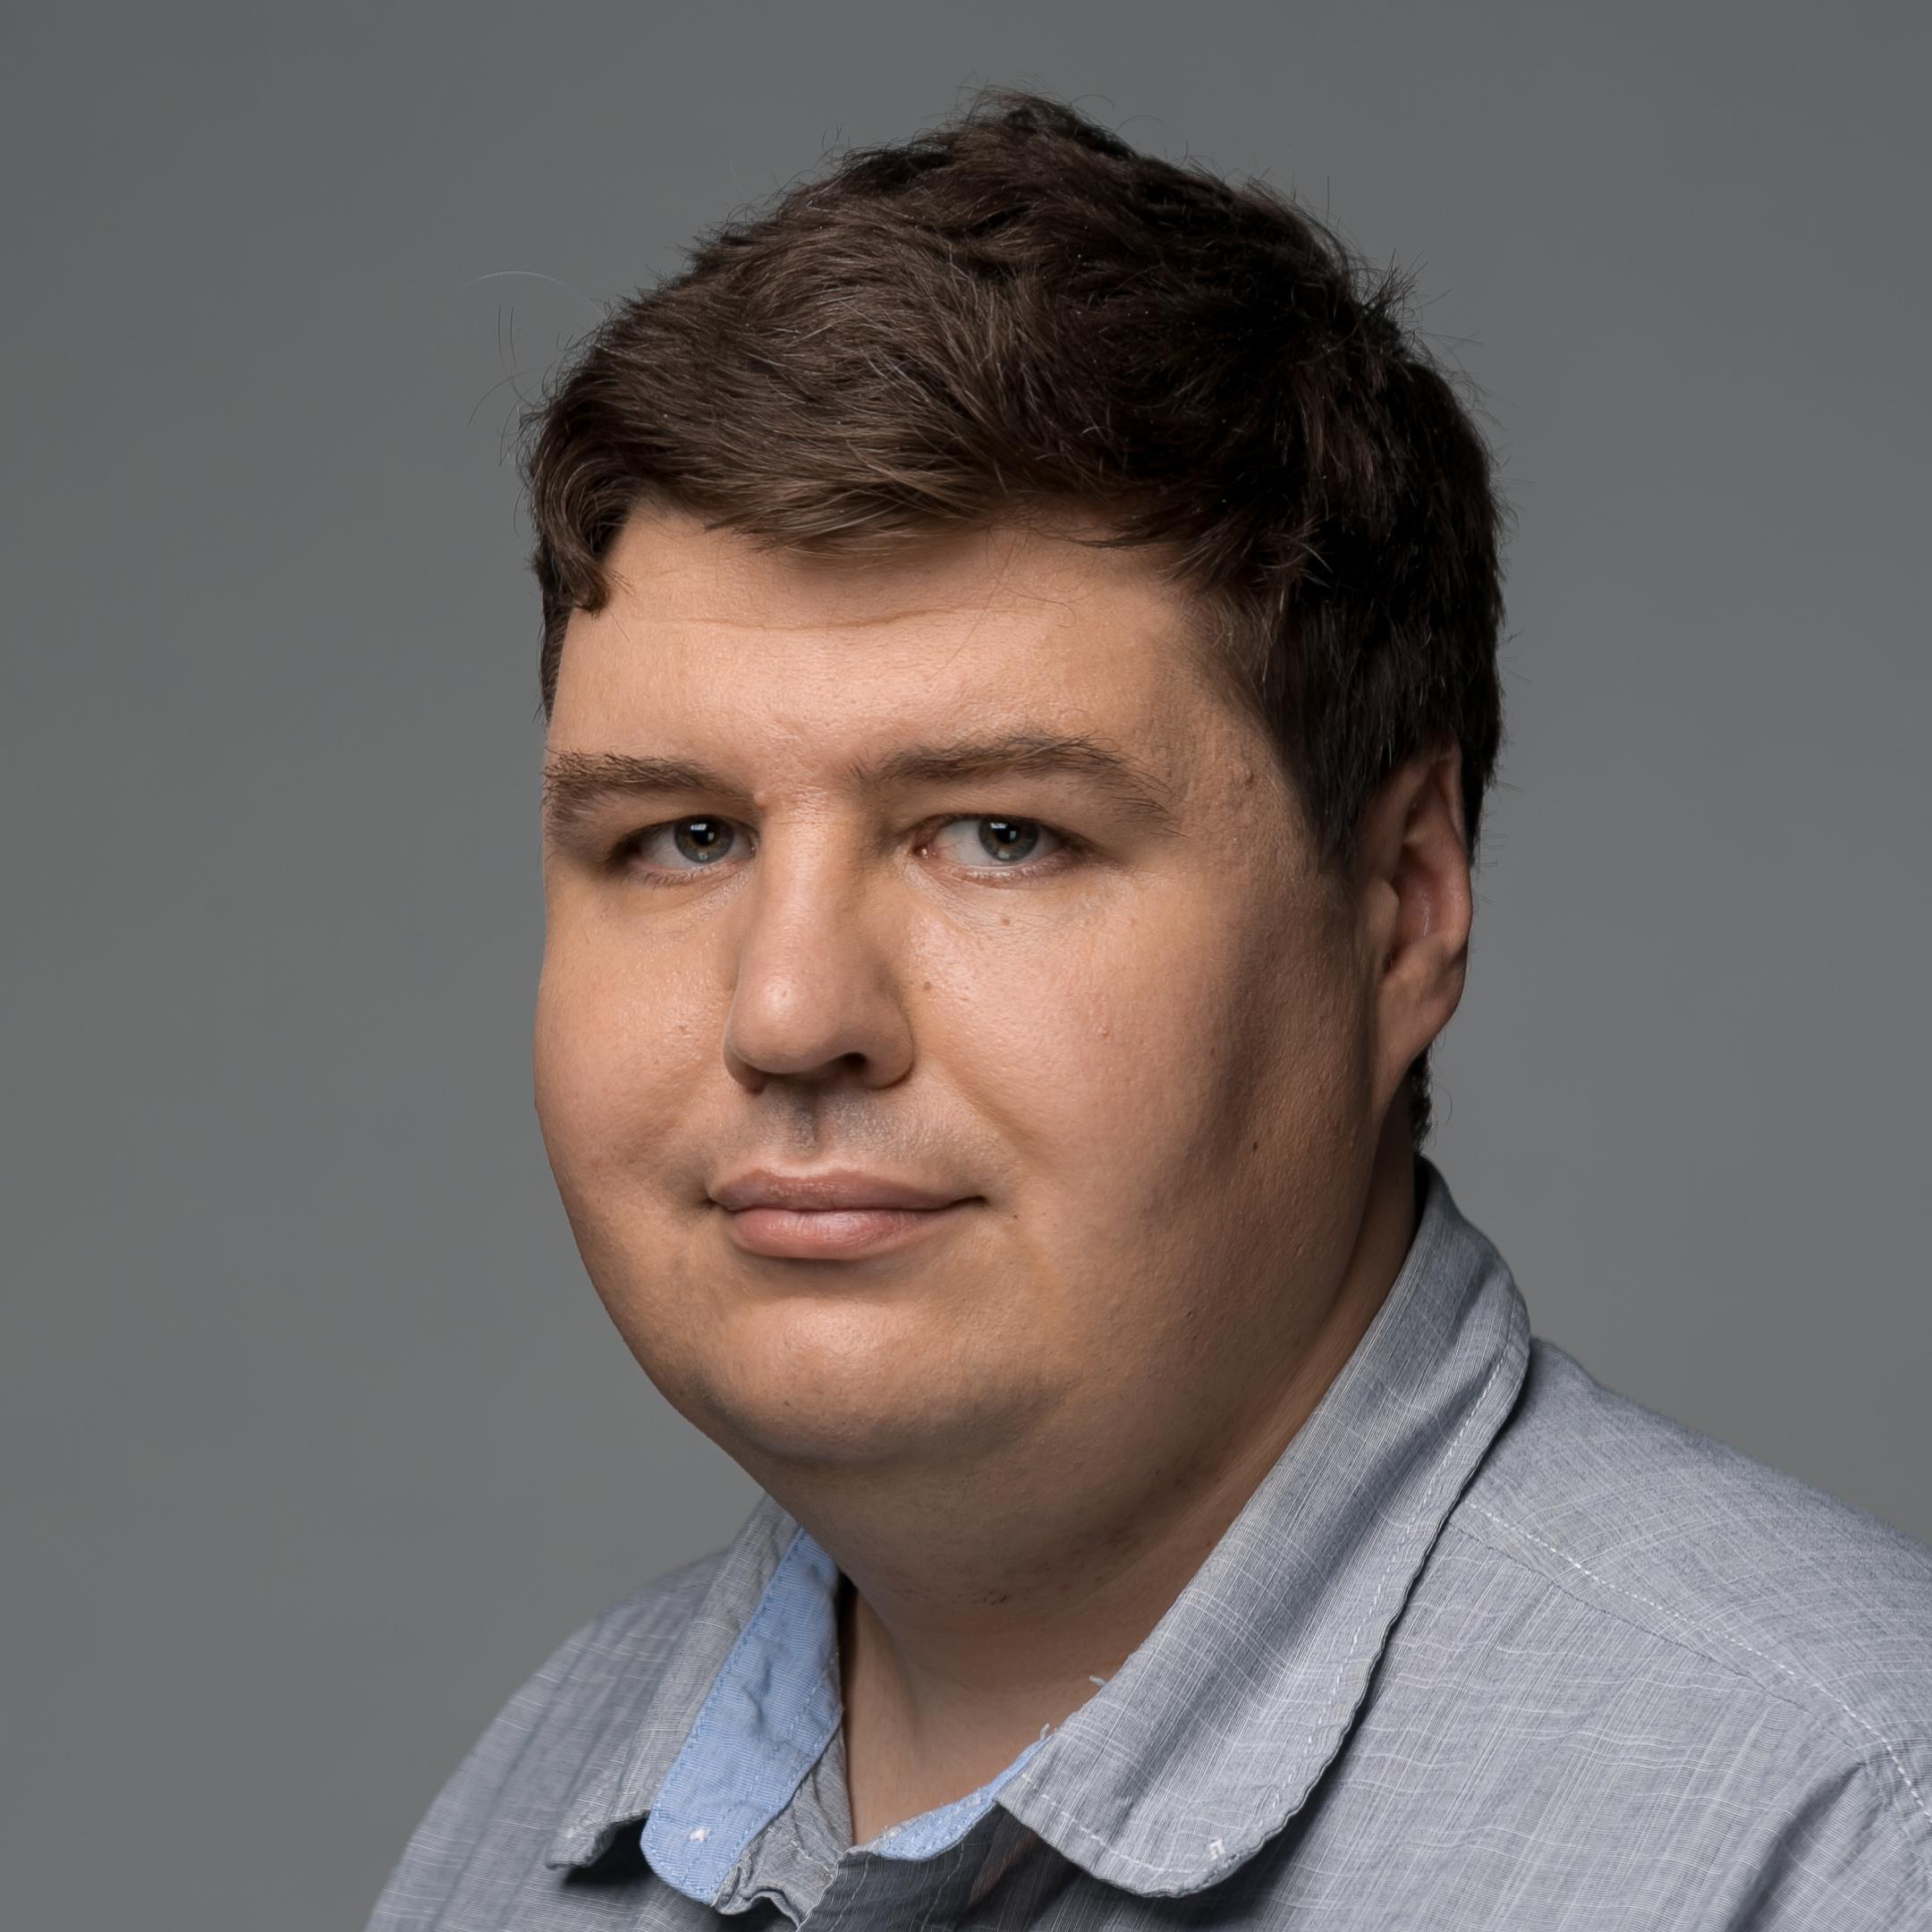 Alexandr Rossokhaty